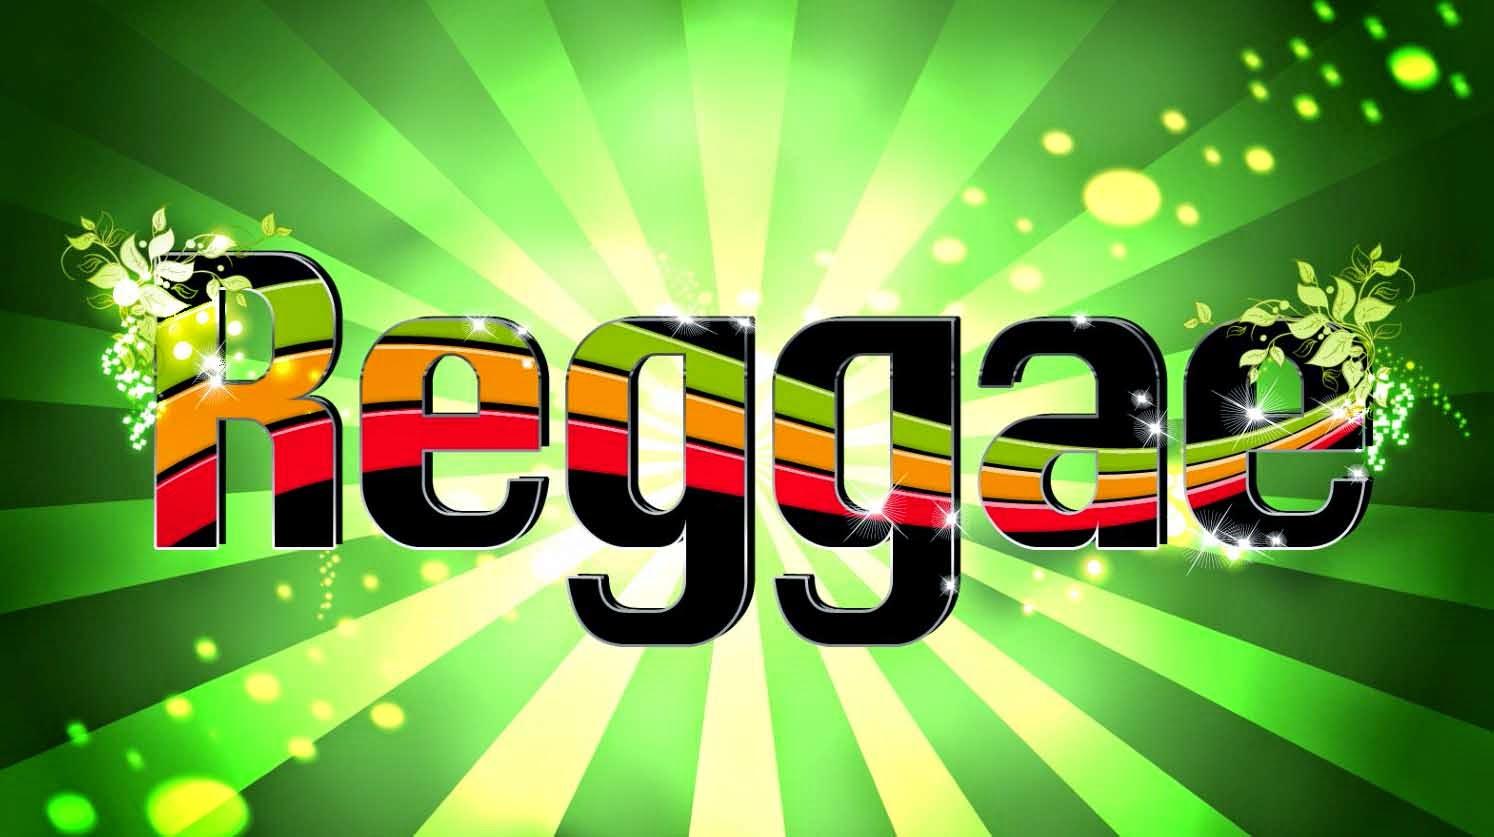 Karakteristik Musik Reggae